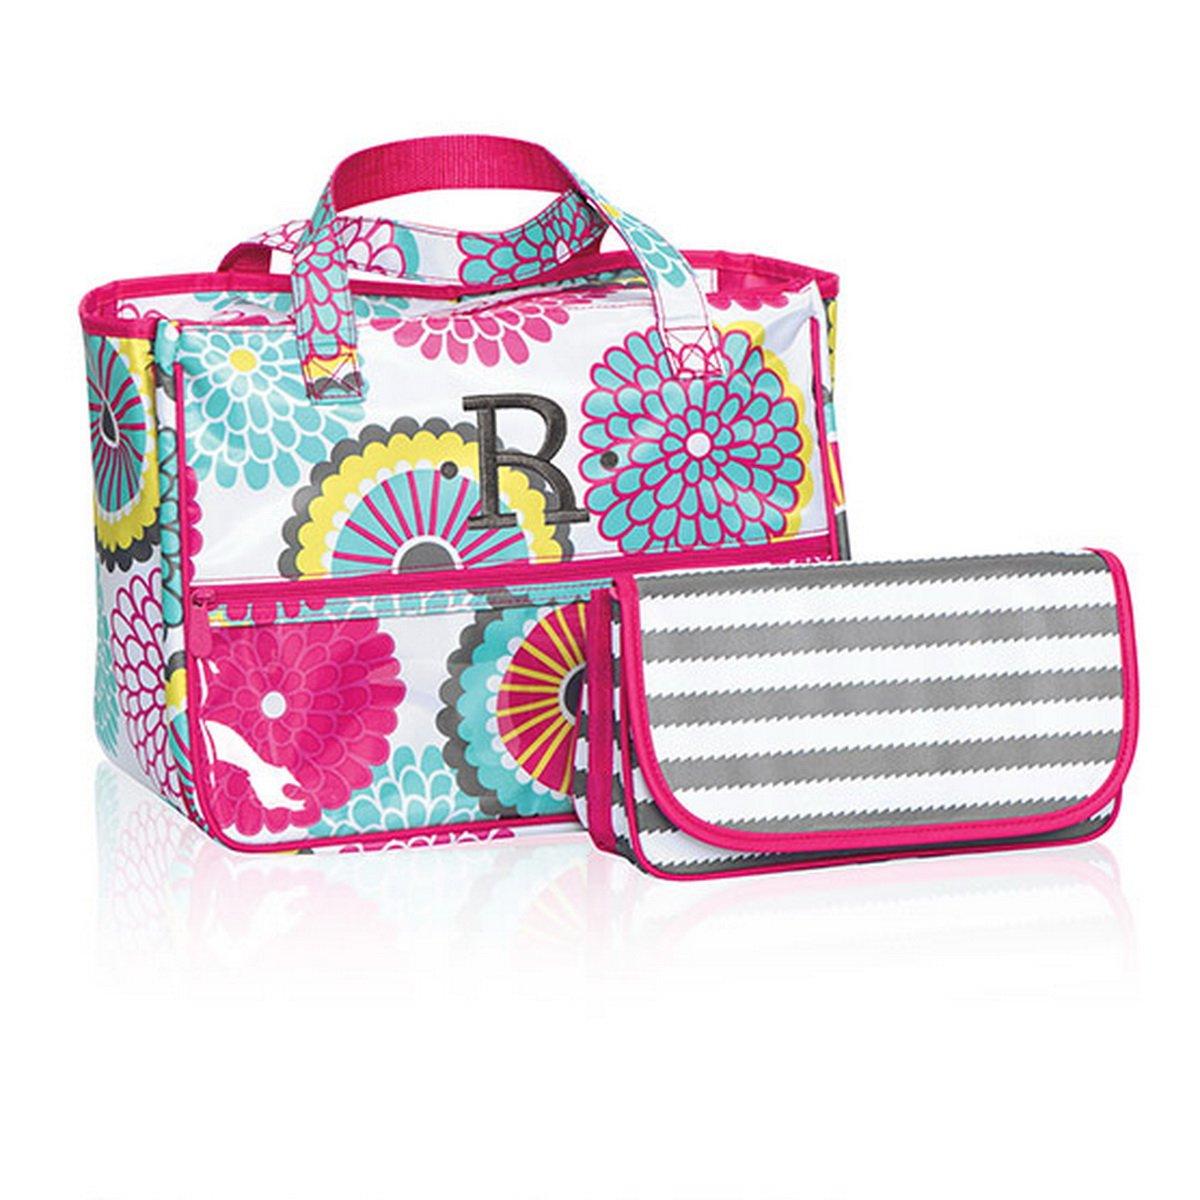 Thirty One True Beauty Bag in Bubble Bloom - 4484